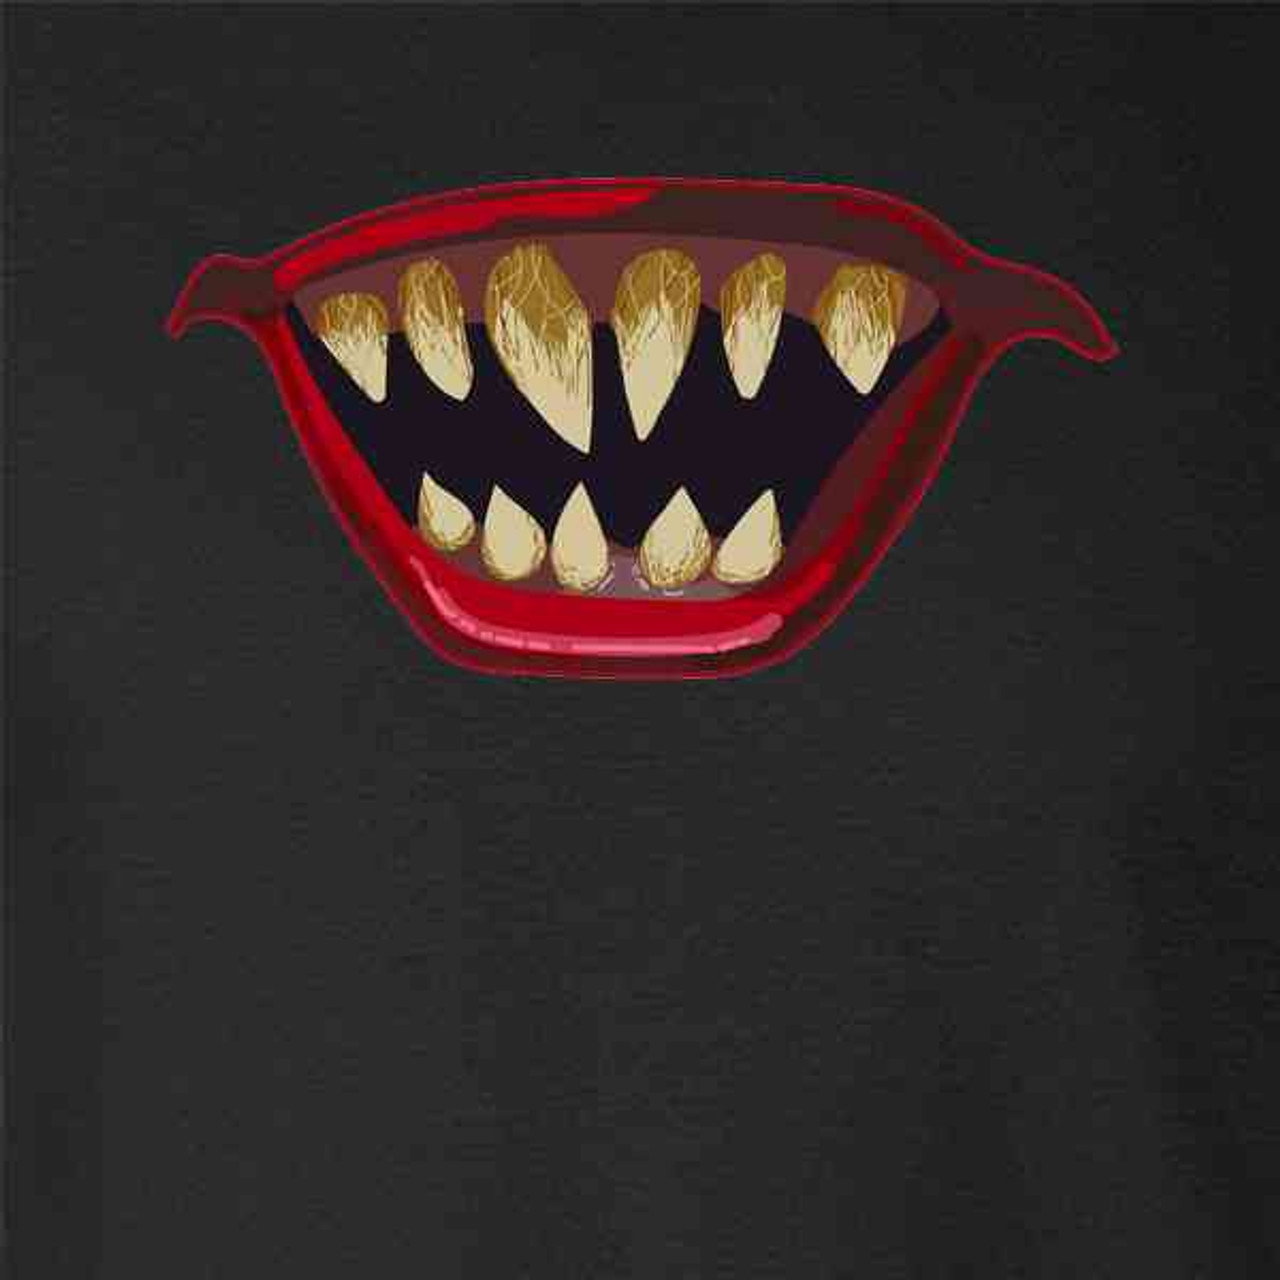 Pop Threads Youll Float Too Horror Clown Halloween Scary Mens Fleece Hoodie Sweatshirt